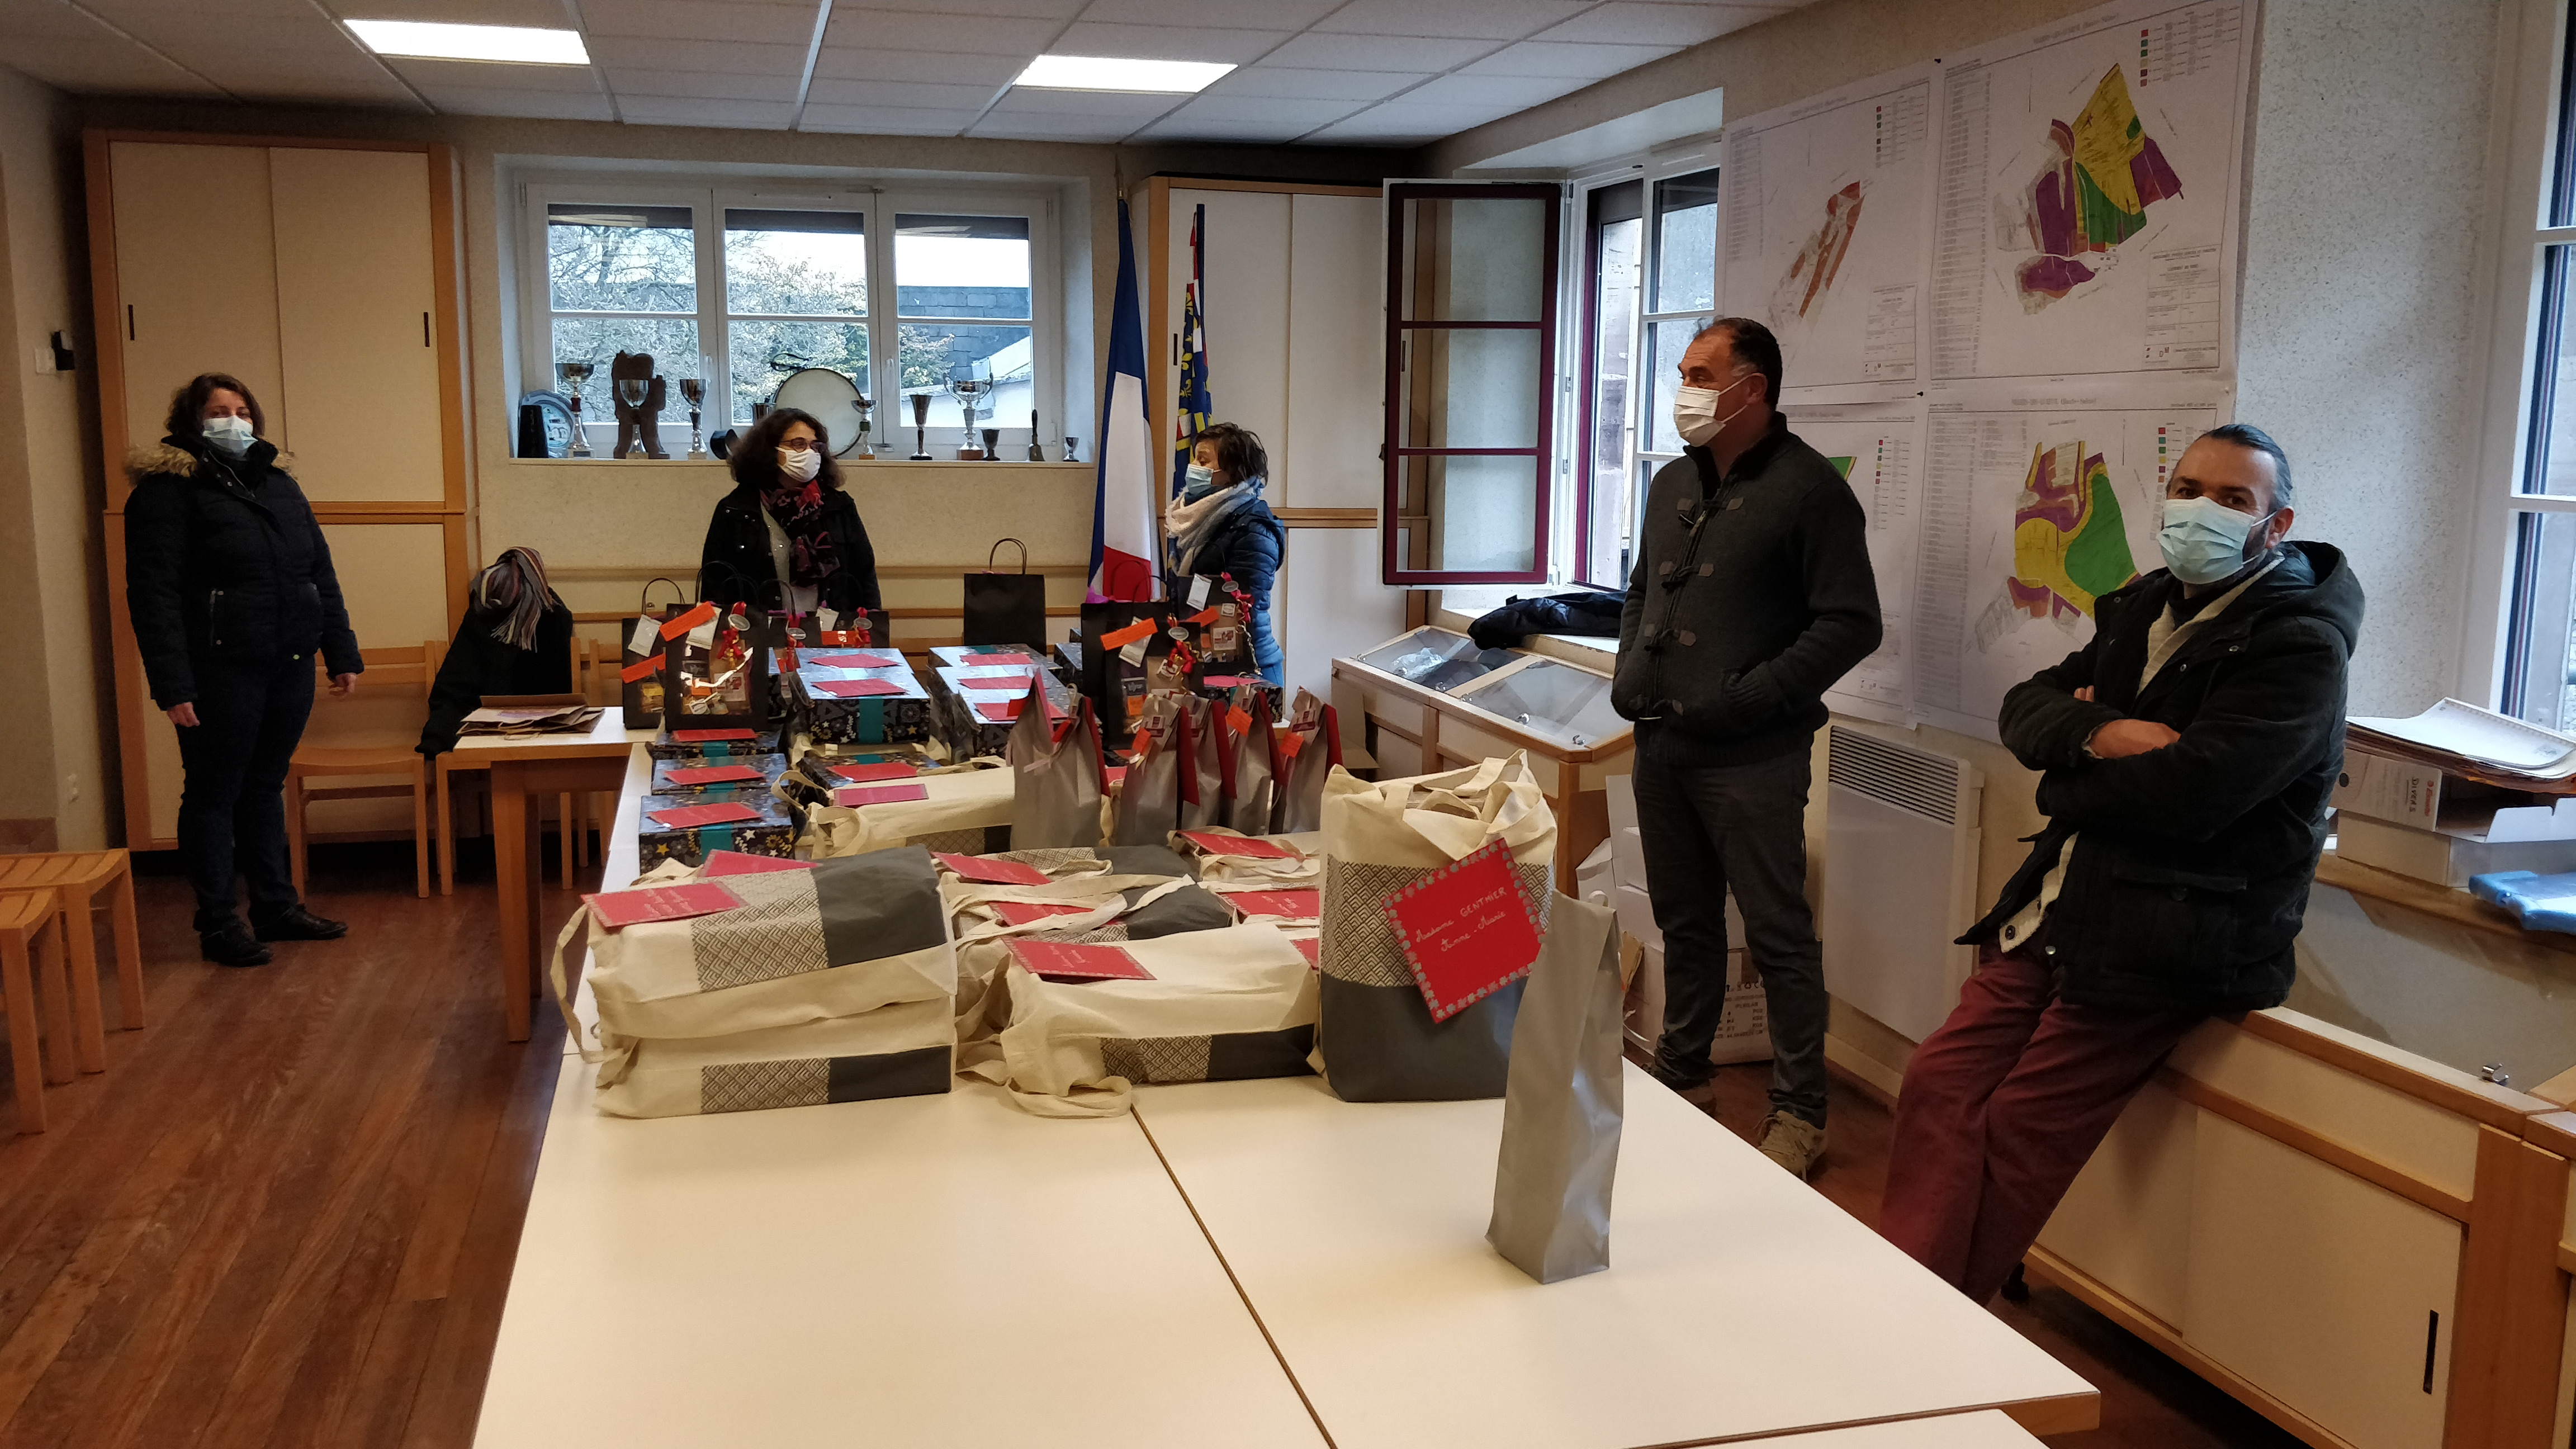 https://www.villers-les-luxeuil.com/projets/villers/files/images/2020_Evenements/12_Colis/IMG_20201219_100328.jpg